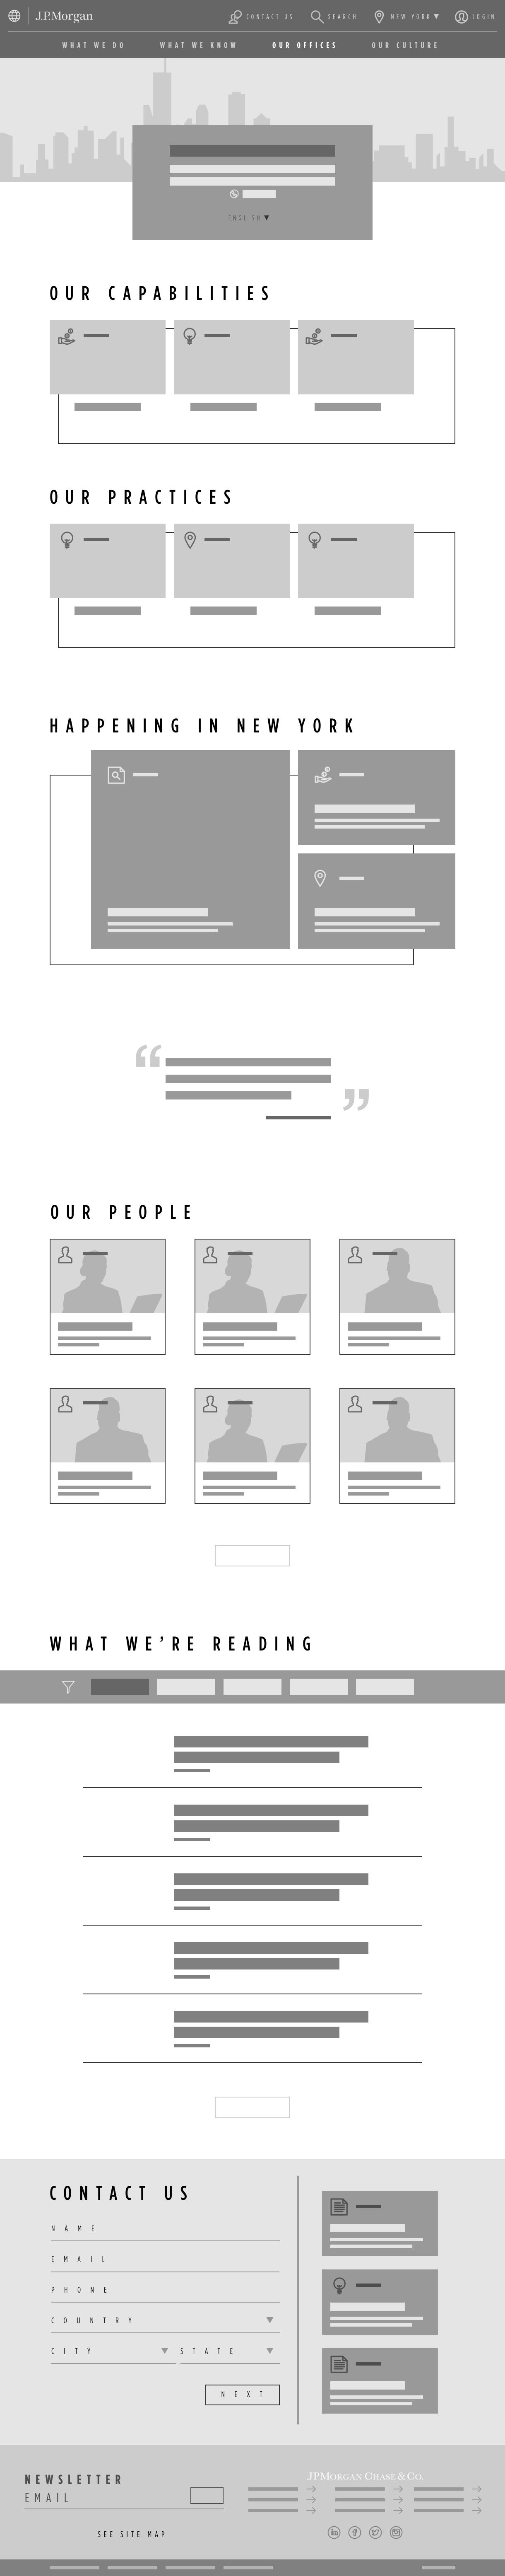 PeopleOffice_Office_Landing_wContent